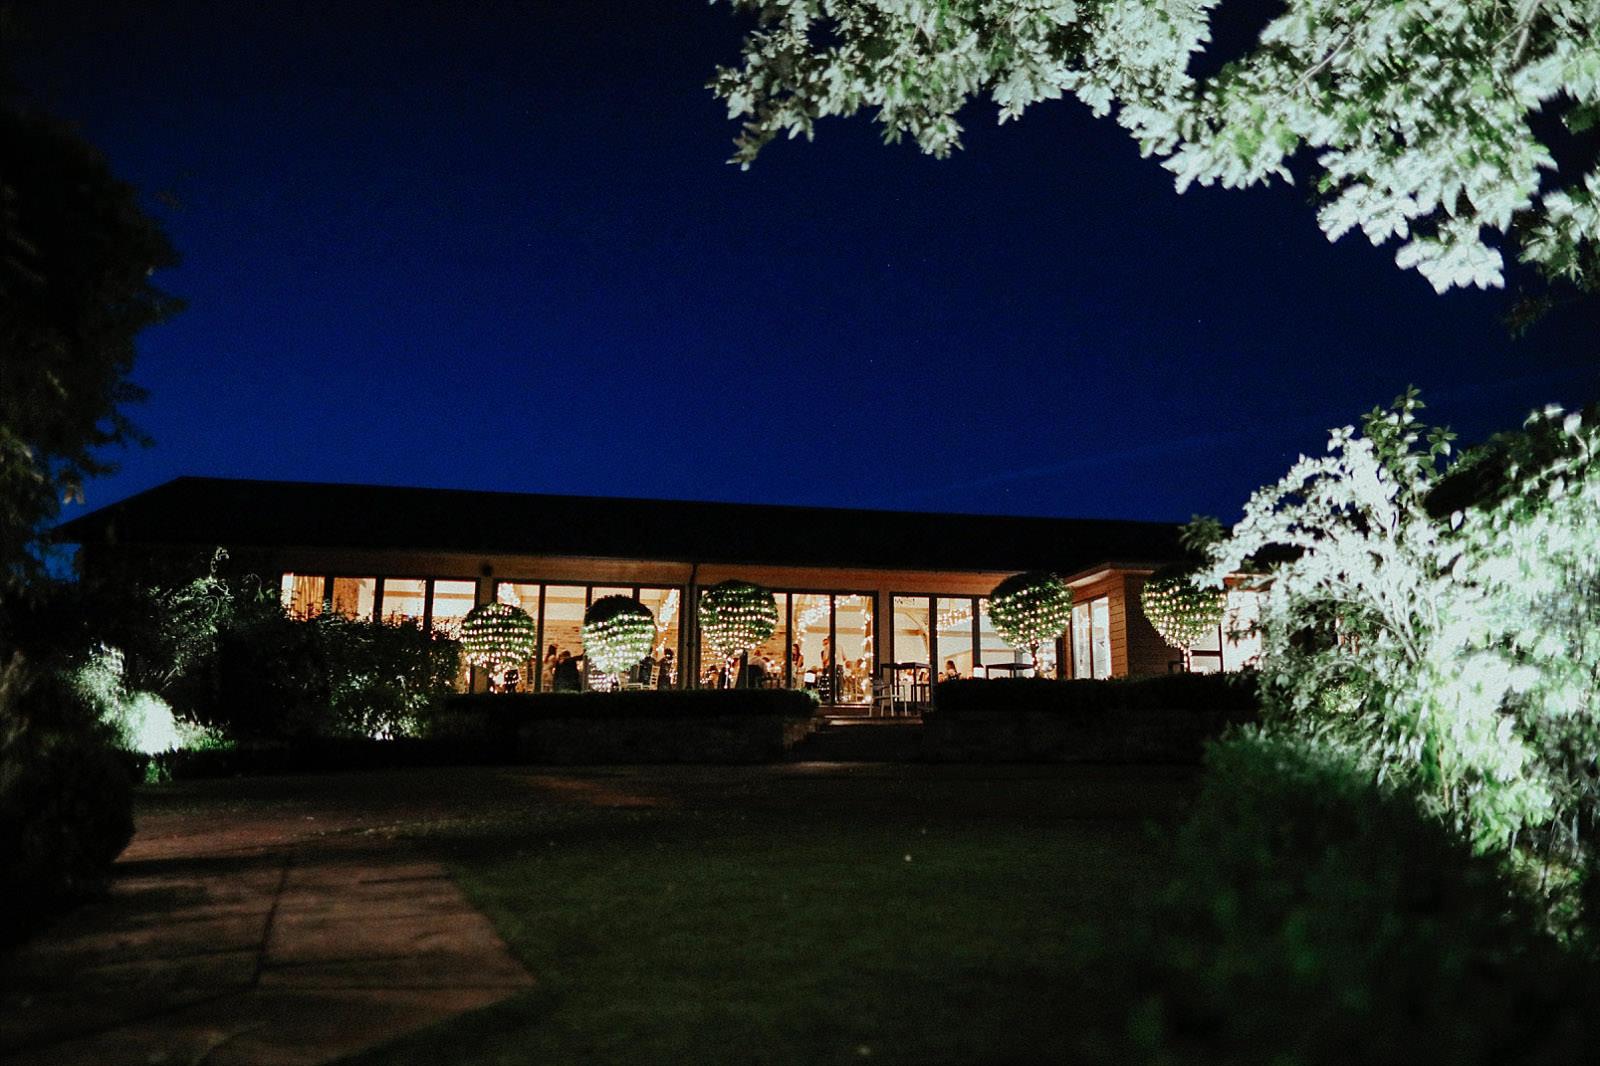 pryor hayes wedding venue at night